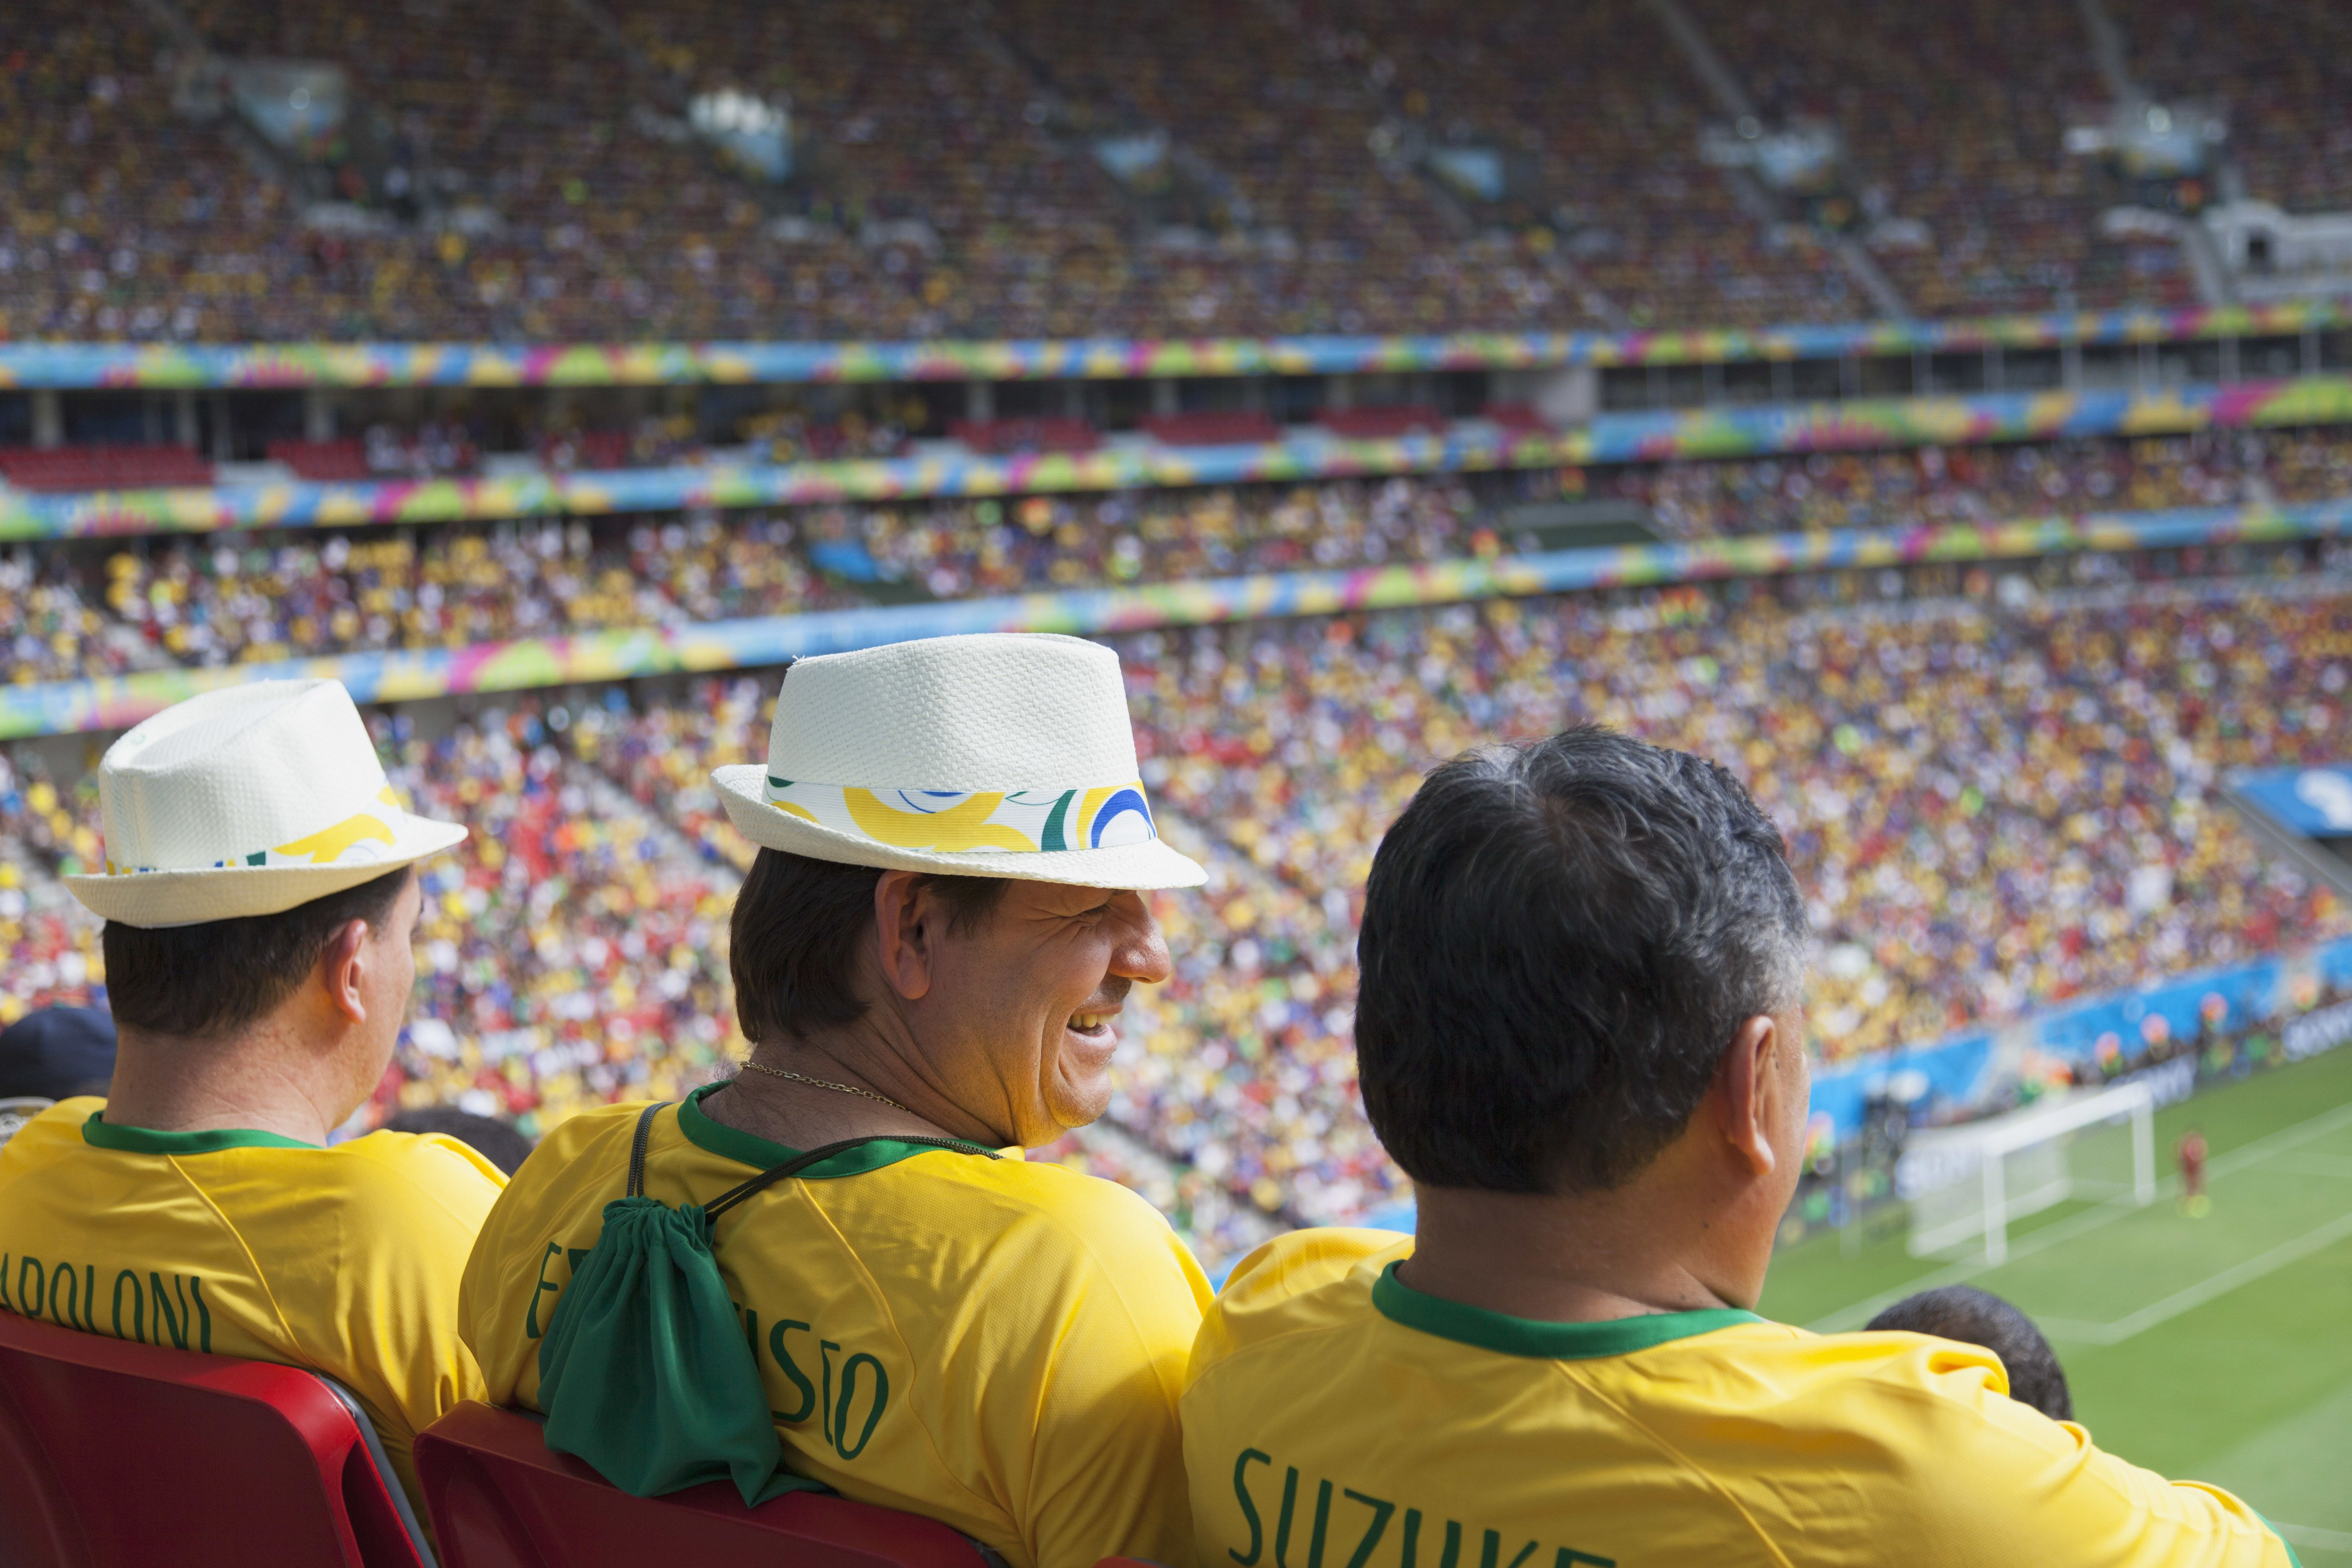 Football fans in Brazil shirts inside National Mane Garrincha Stadium for World Cup match, Brasilia, Federal District, Brazil